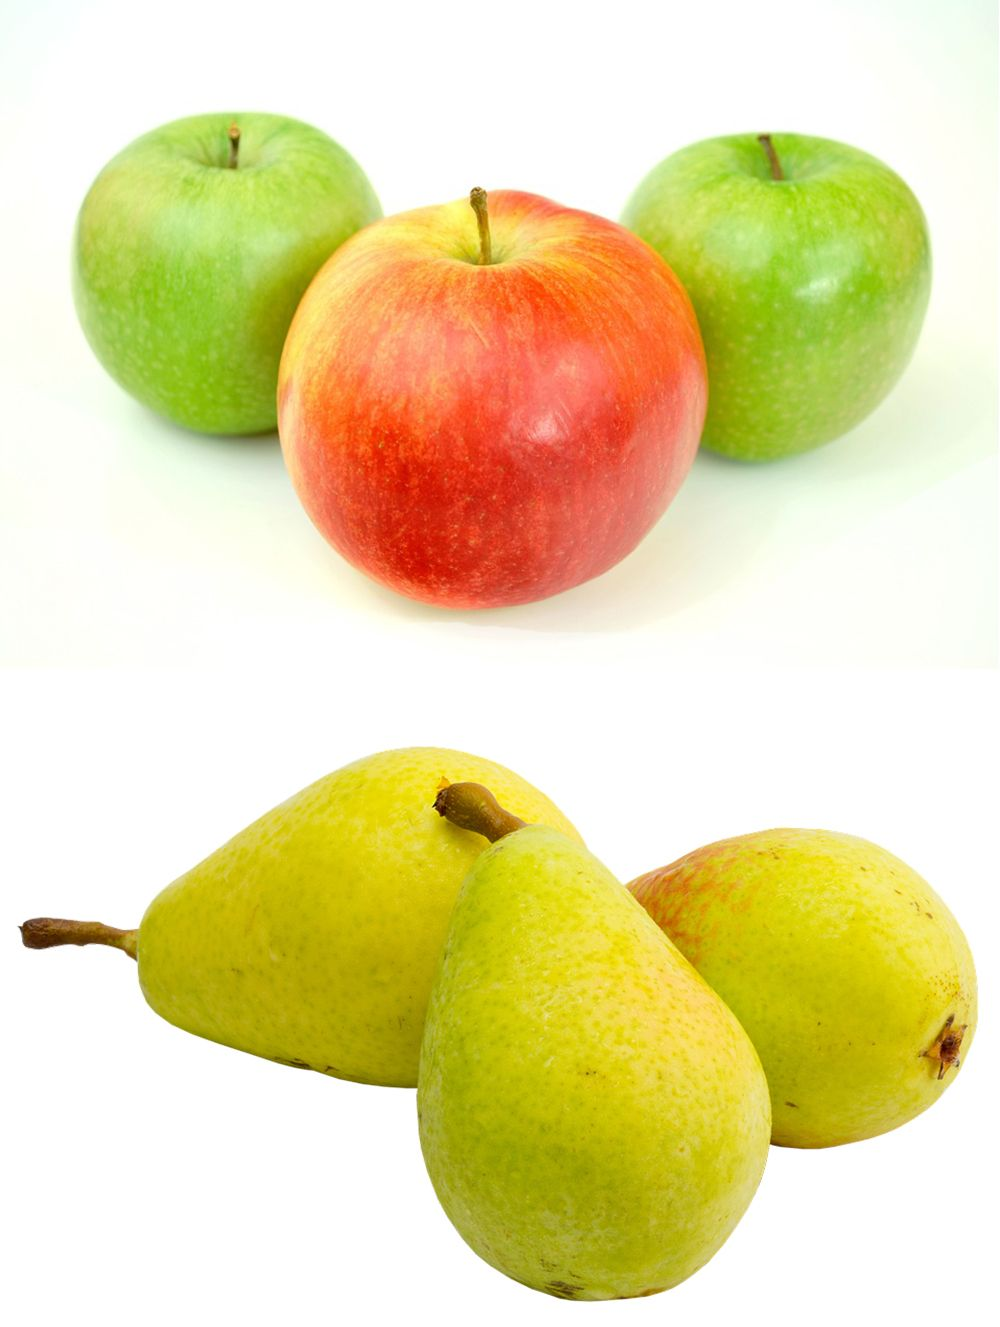 Jablka Czy Gruszki Fruit Pear Apple